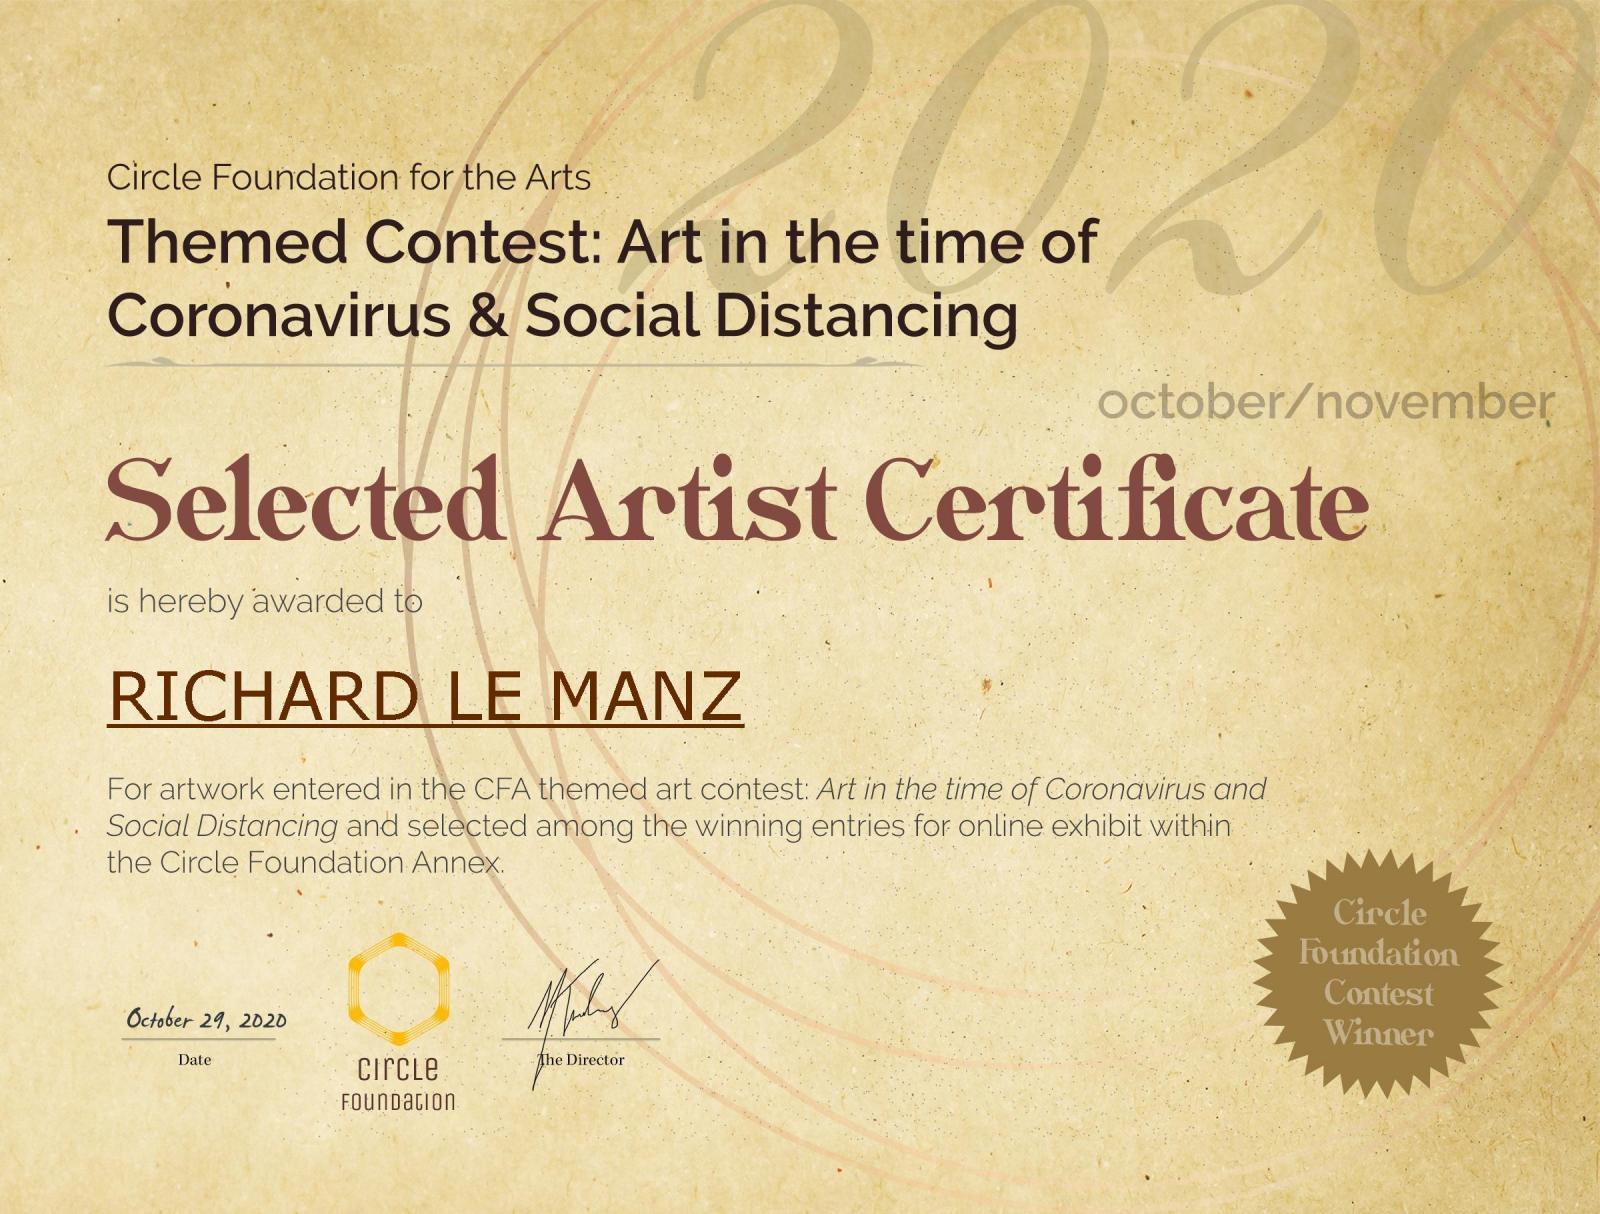 Photography image - Loading CFA_Contest_Certificate_SelectedArtist_RICHARD_LE_MANZ.jpg